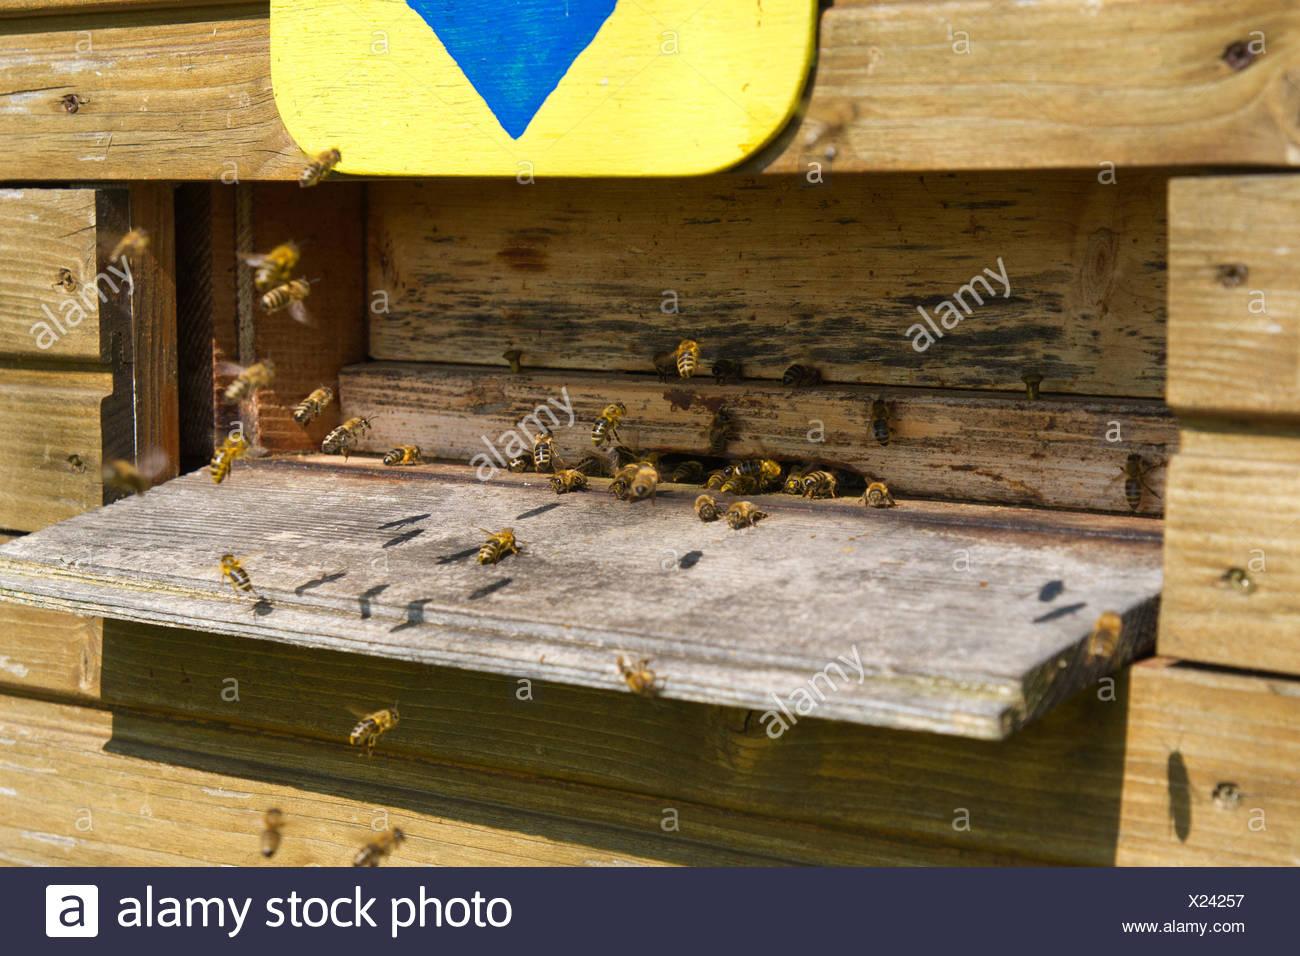 Bee Sting Stockfotos & Bee Sting Bilder - Seite 4 - Alamy